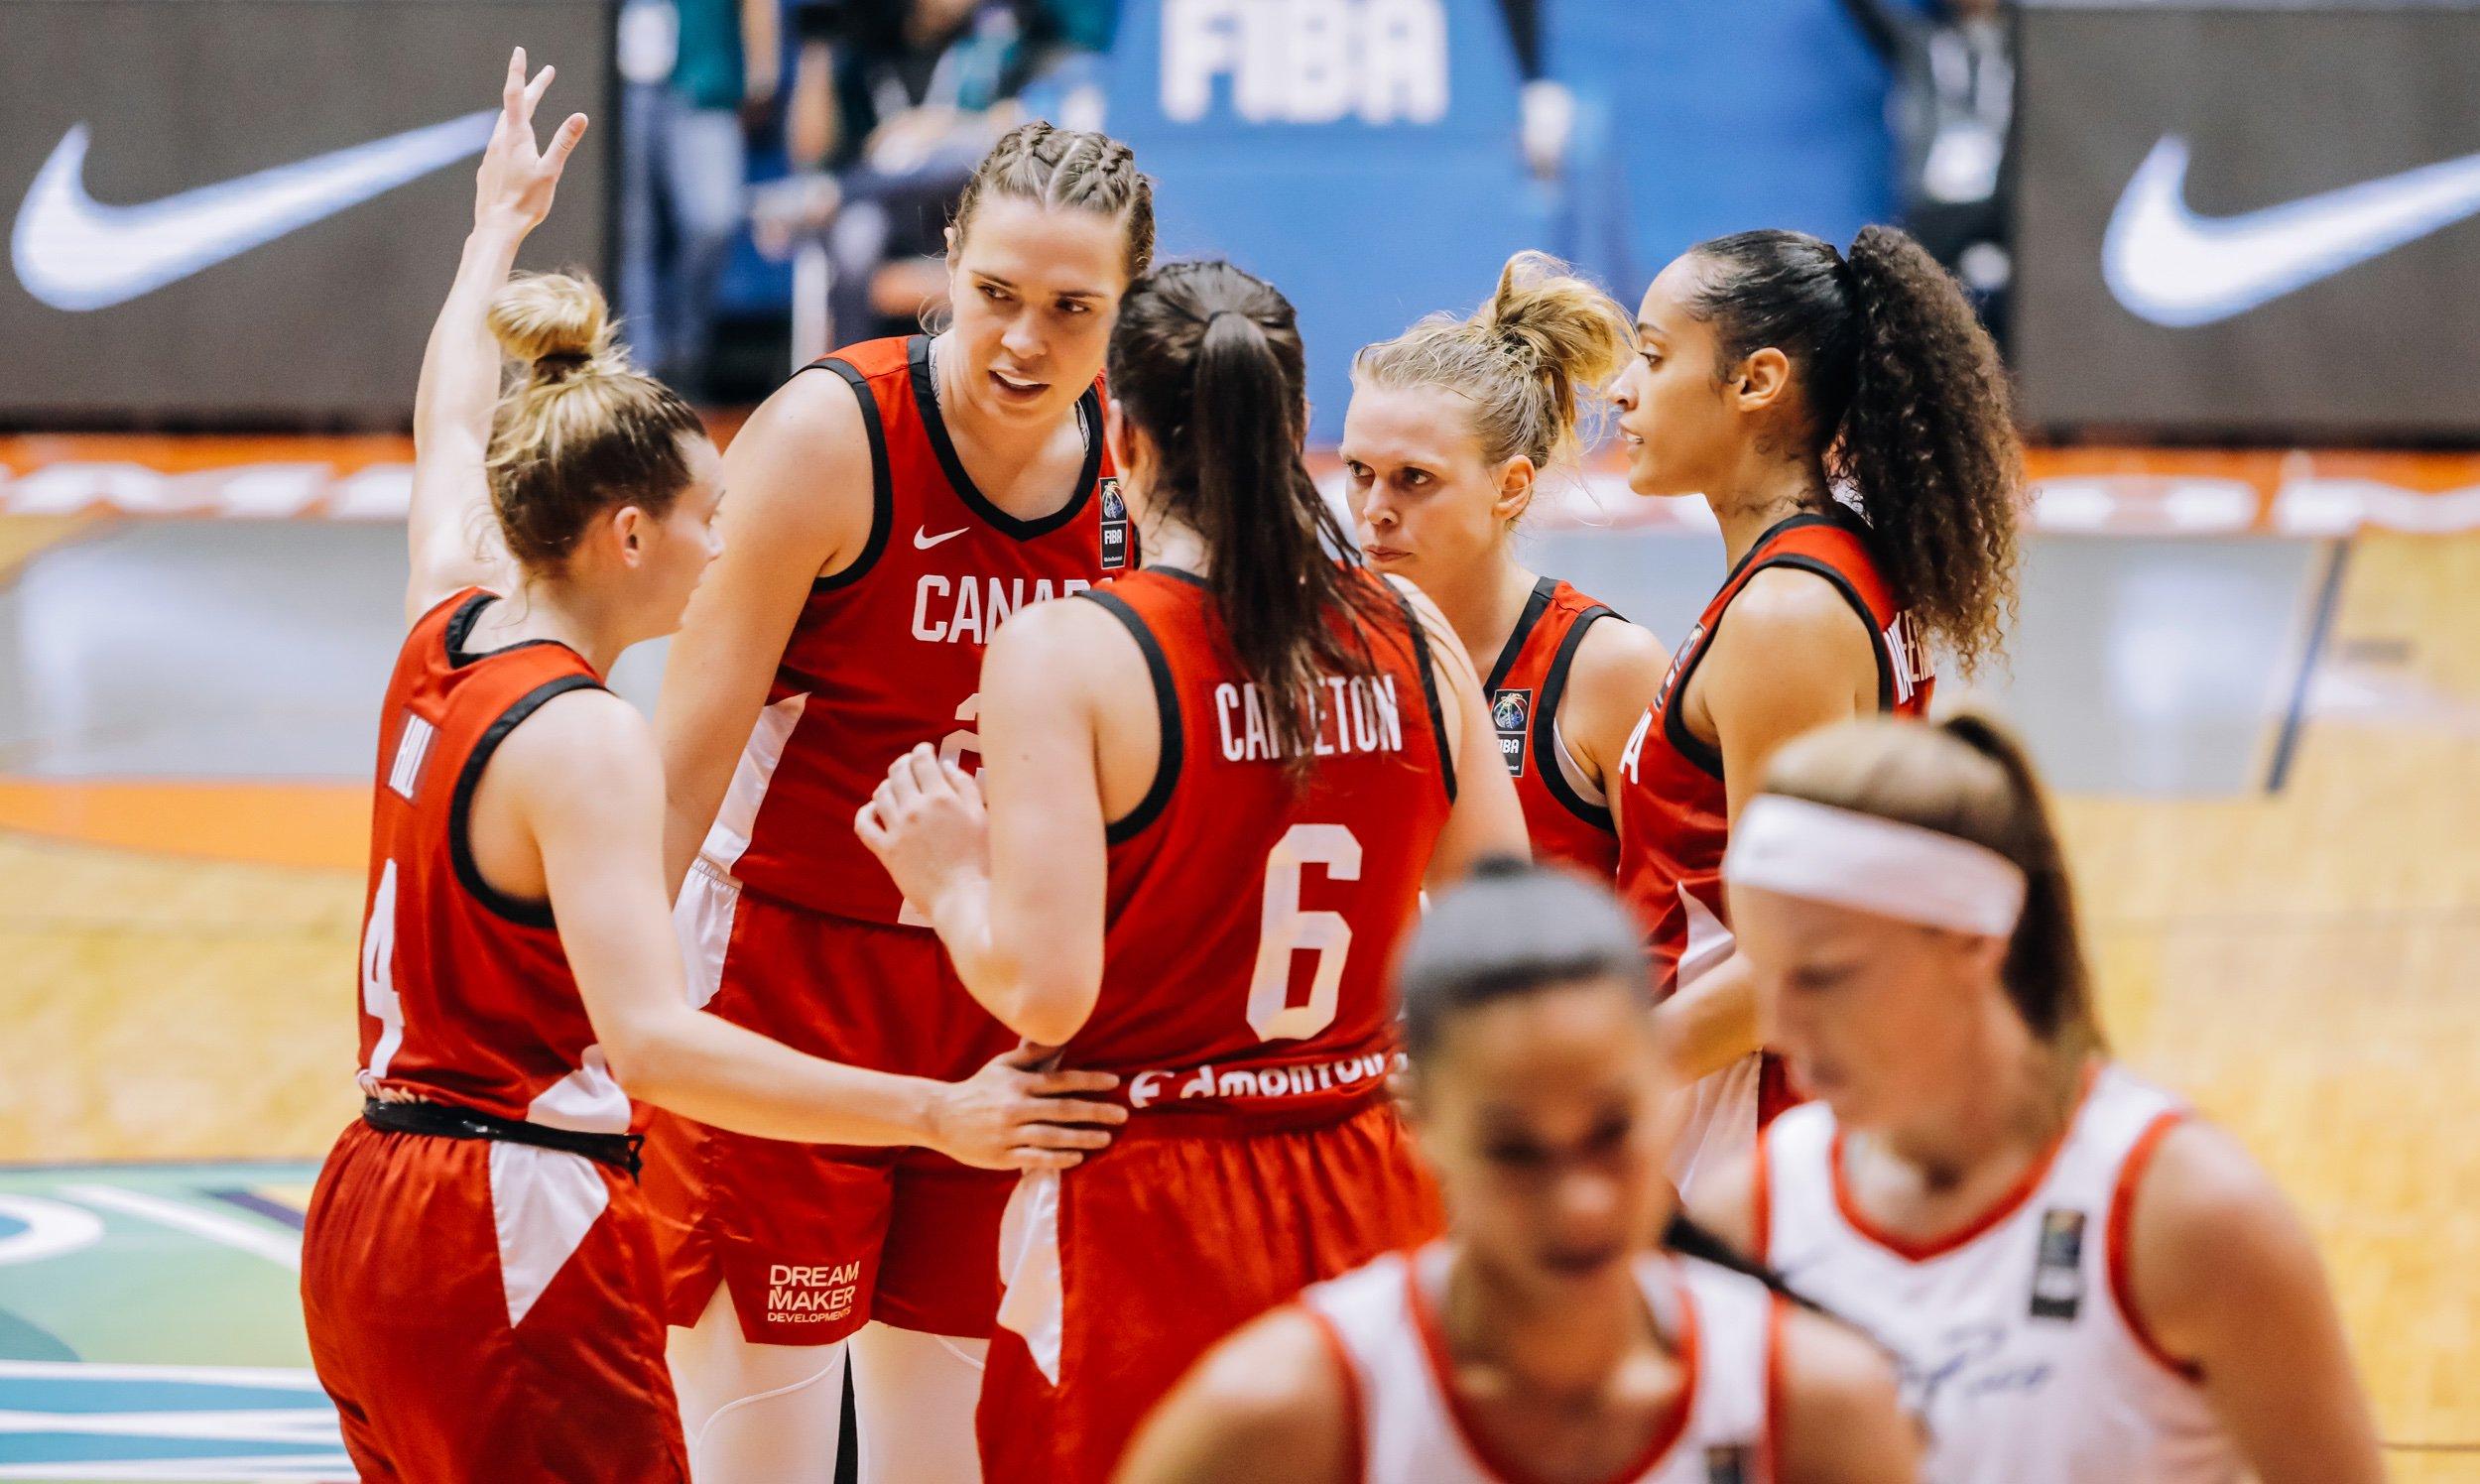 FIBA Women's Olympic Pre-Qualifying tournament coming to Edmonton this November